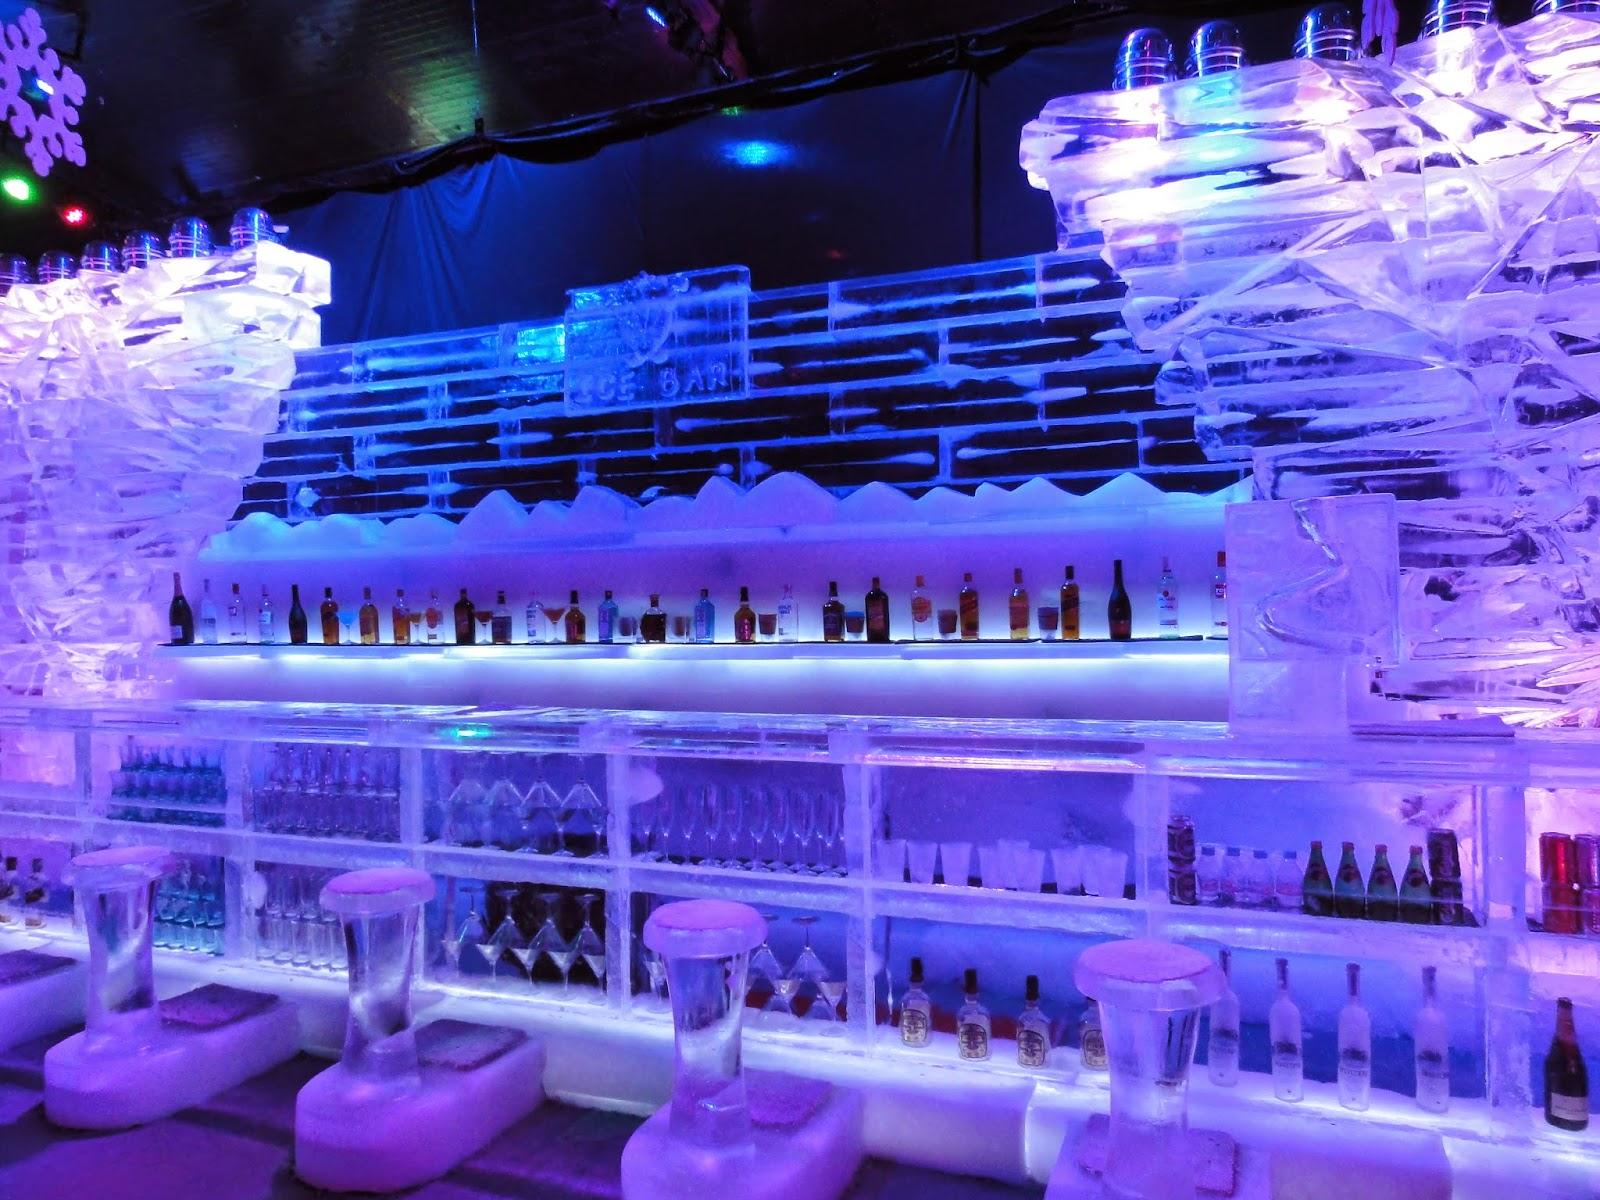 Ice Sculpture Bar The Venetian Macao